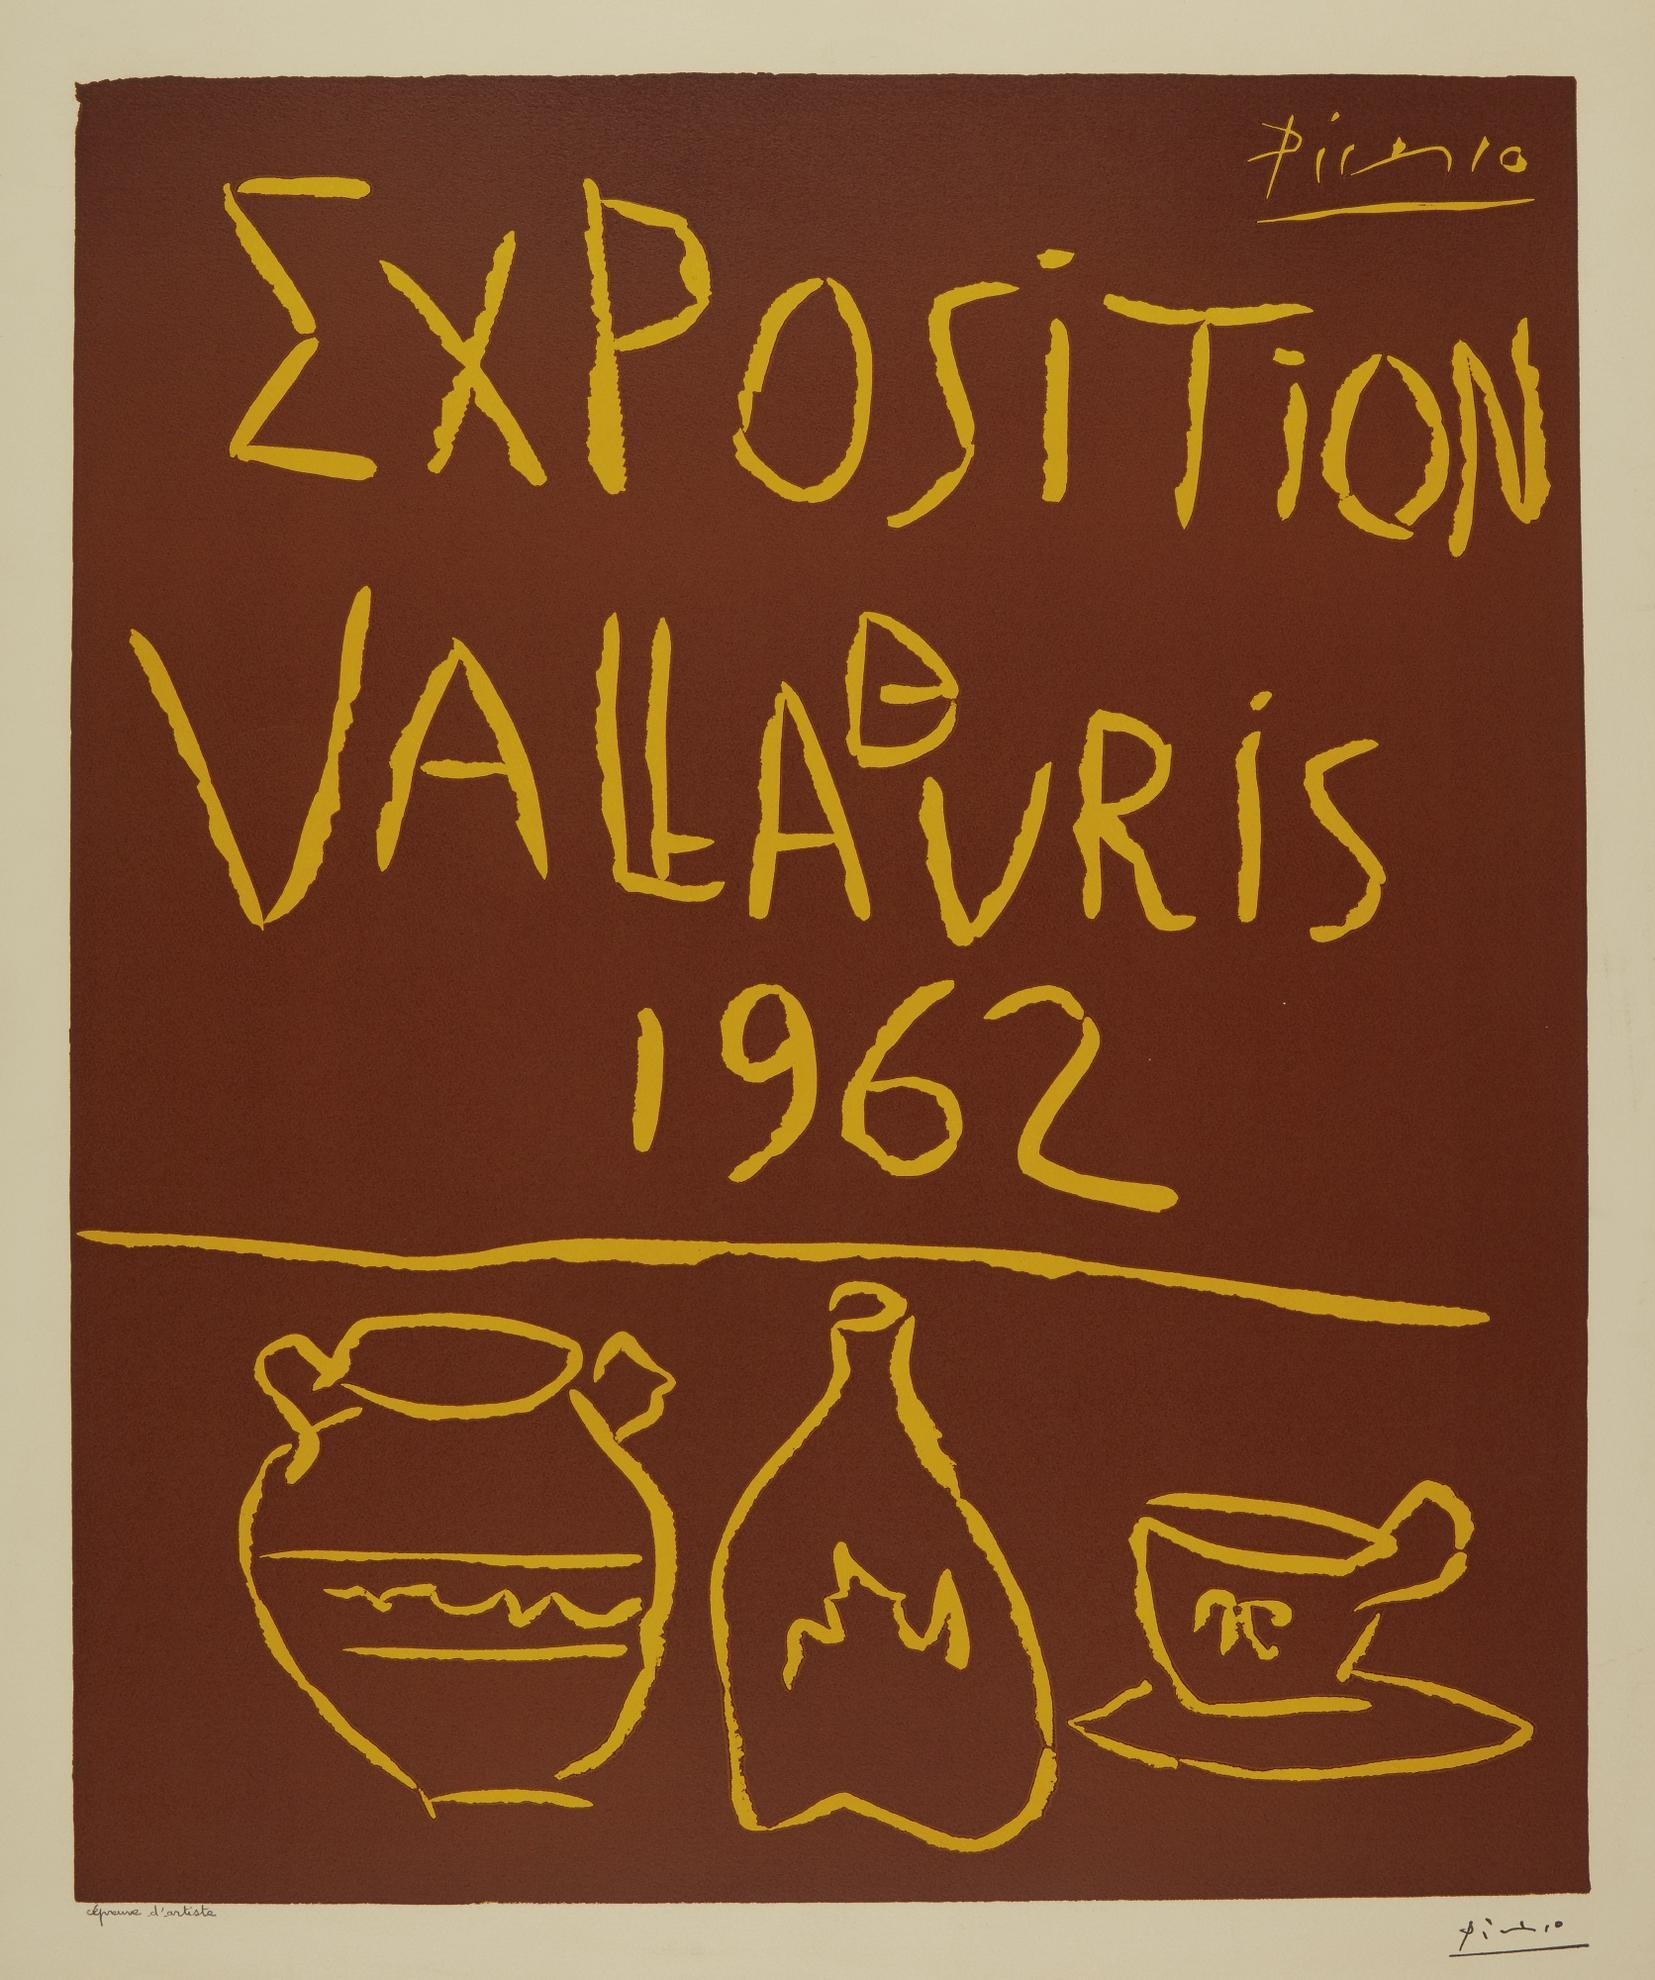 Pablo Picasso-Exposition De Vallauris 1962 (B. 1299; Ba. 1335)-1962